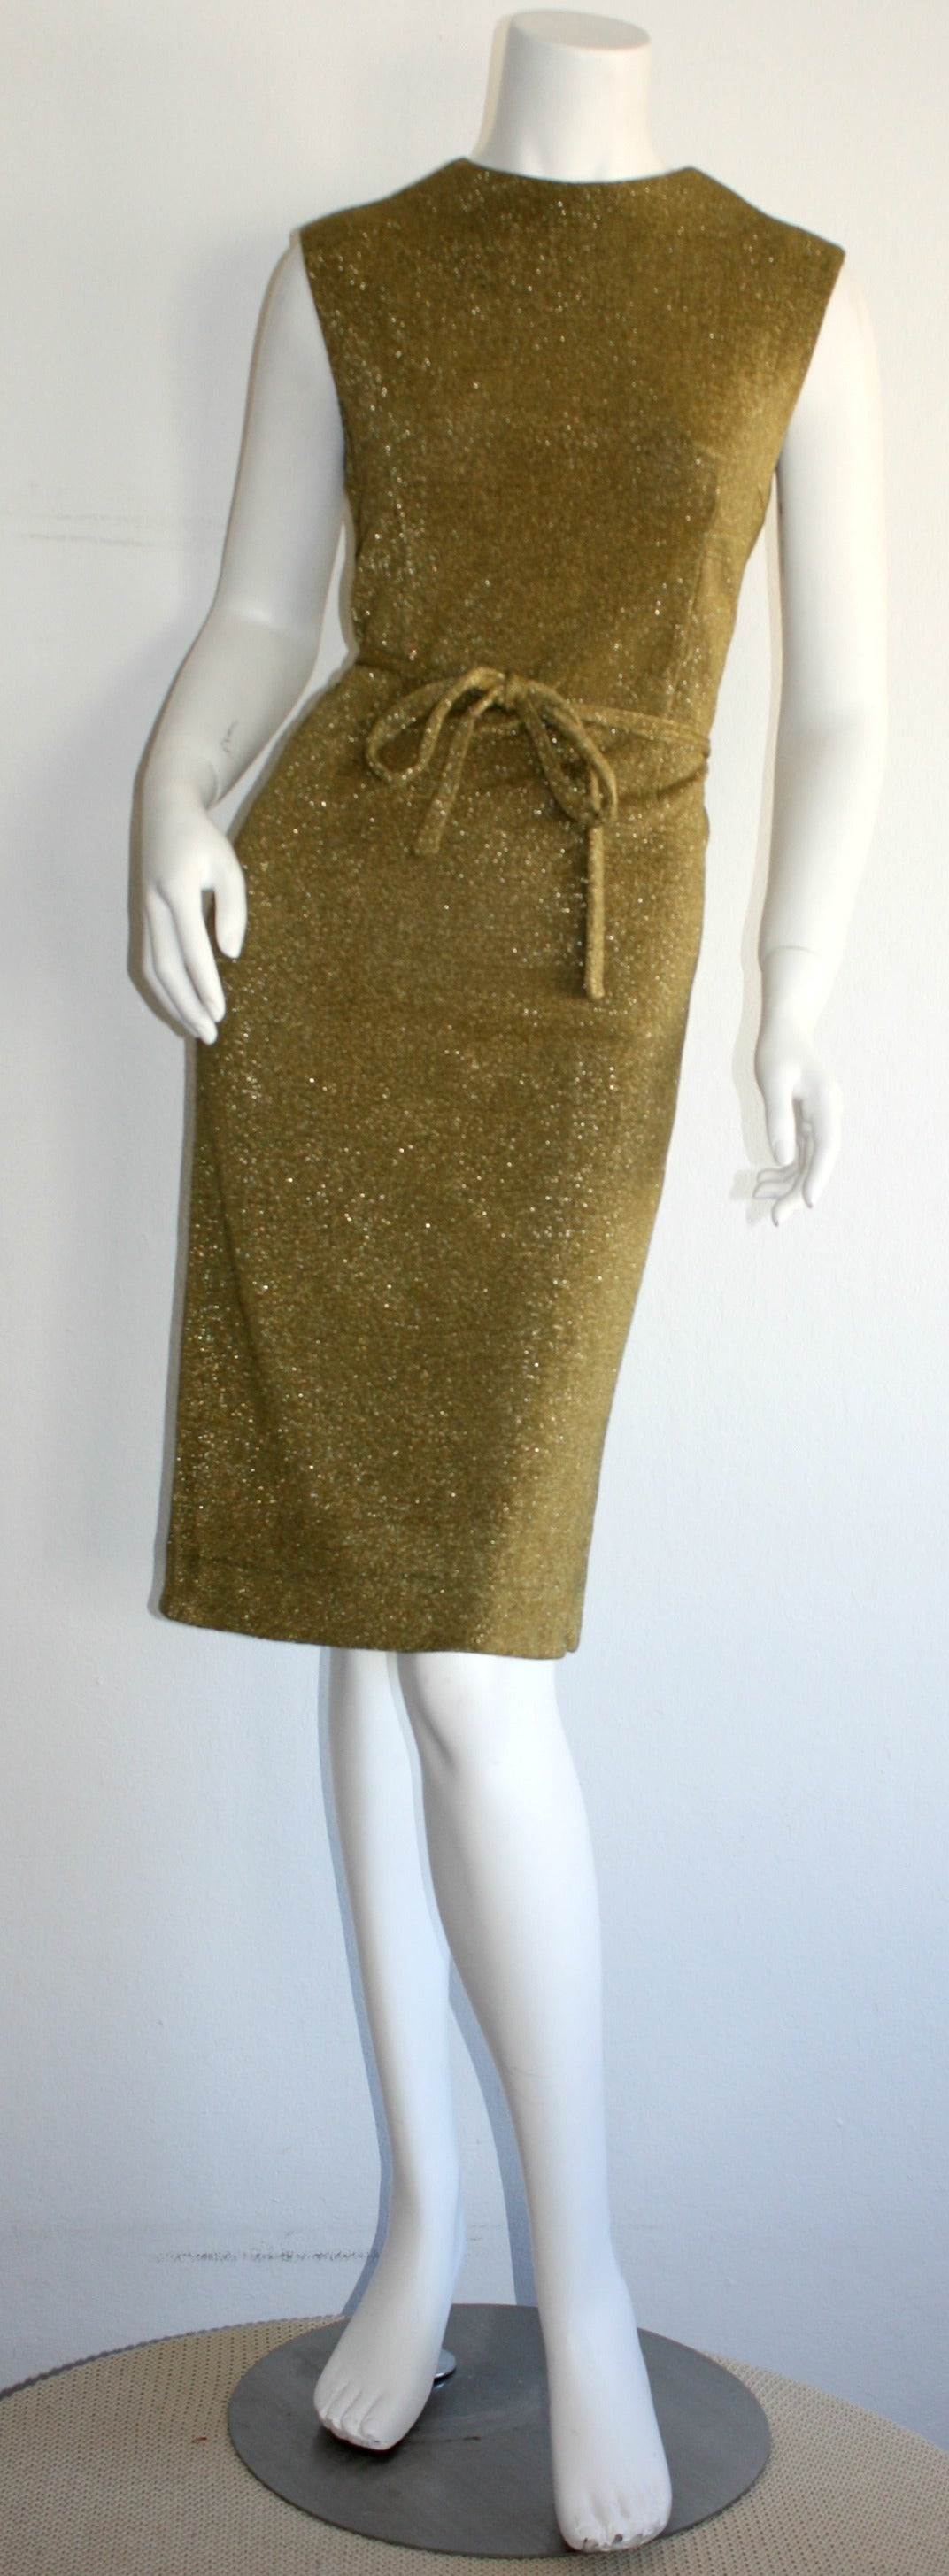 Rudi Gernreich For Harmon Knits 1960s Gold Metallic Dress 2